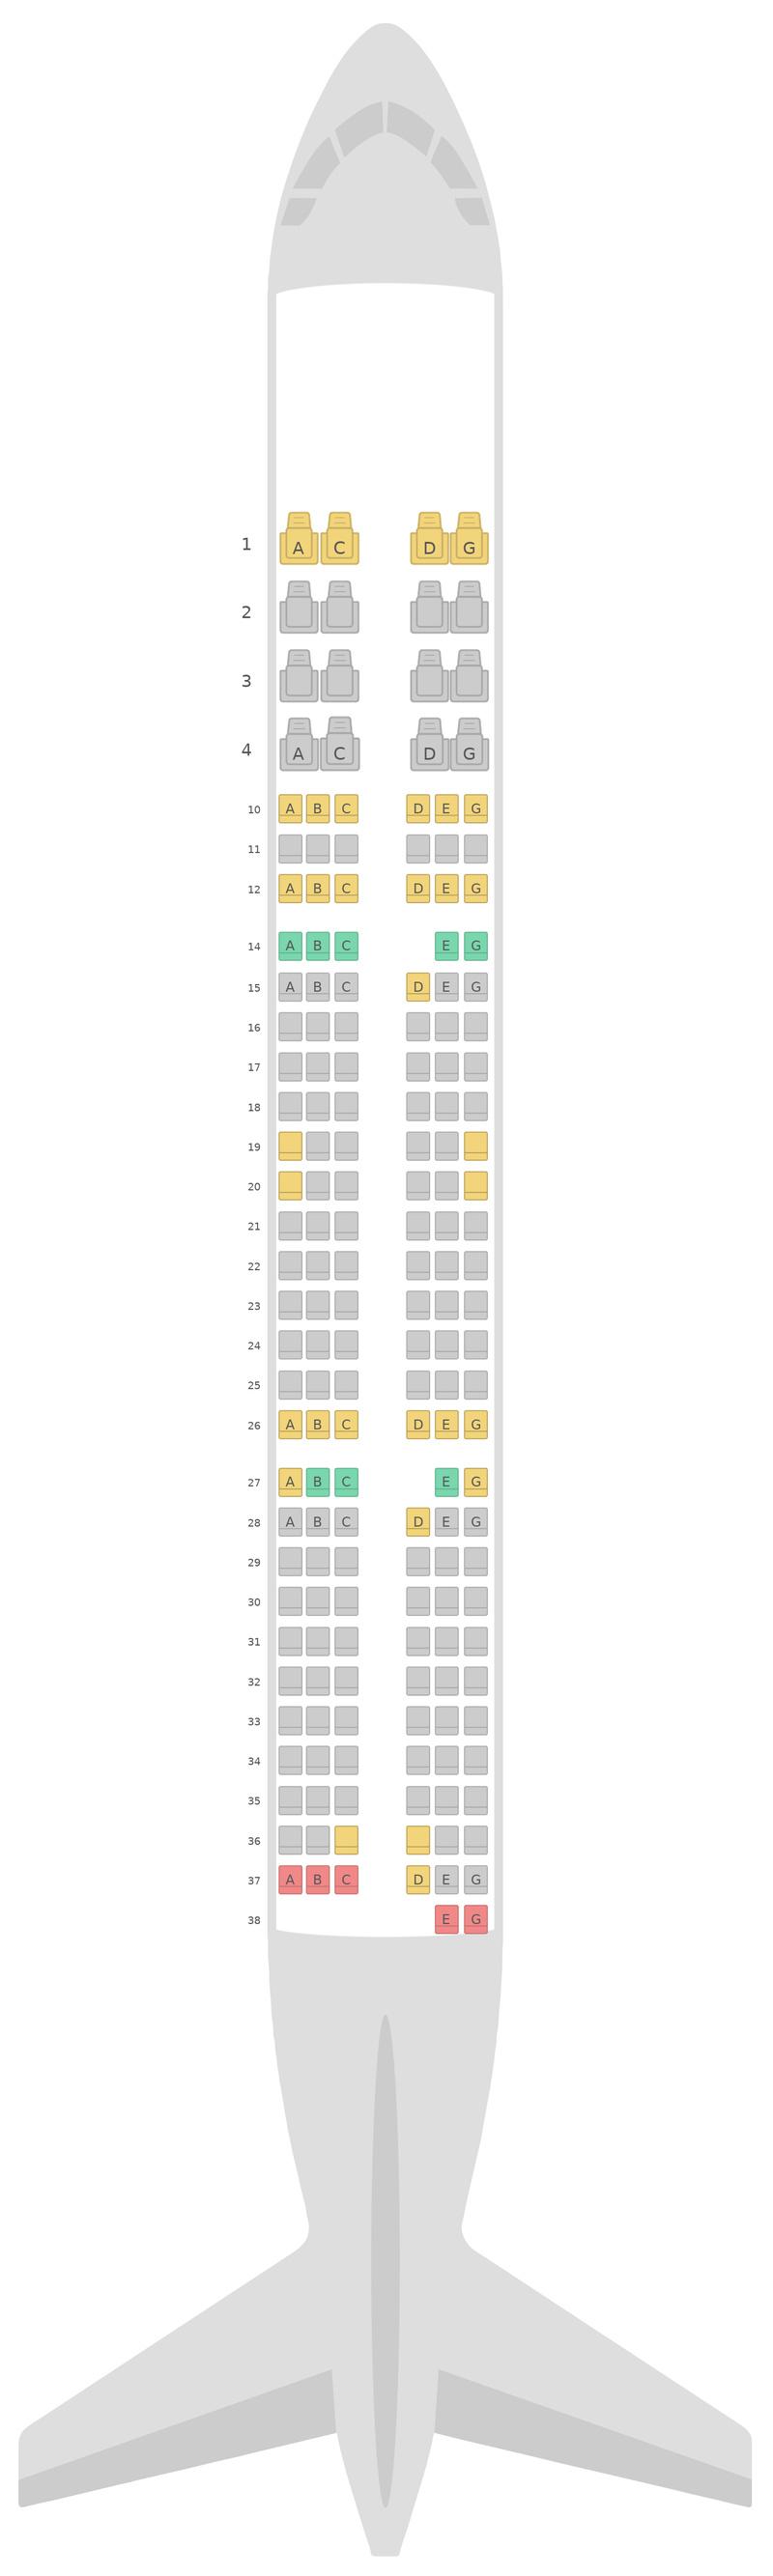 Схема салона Аэробус А321 v1 Вьетнамские авиалинии